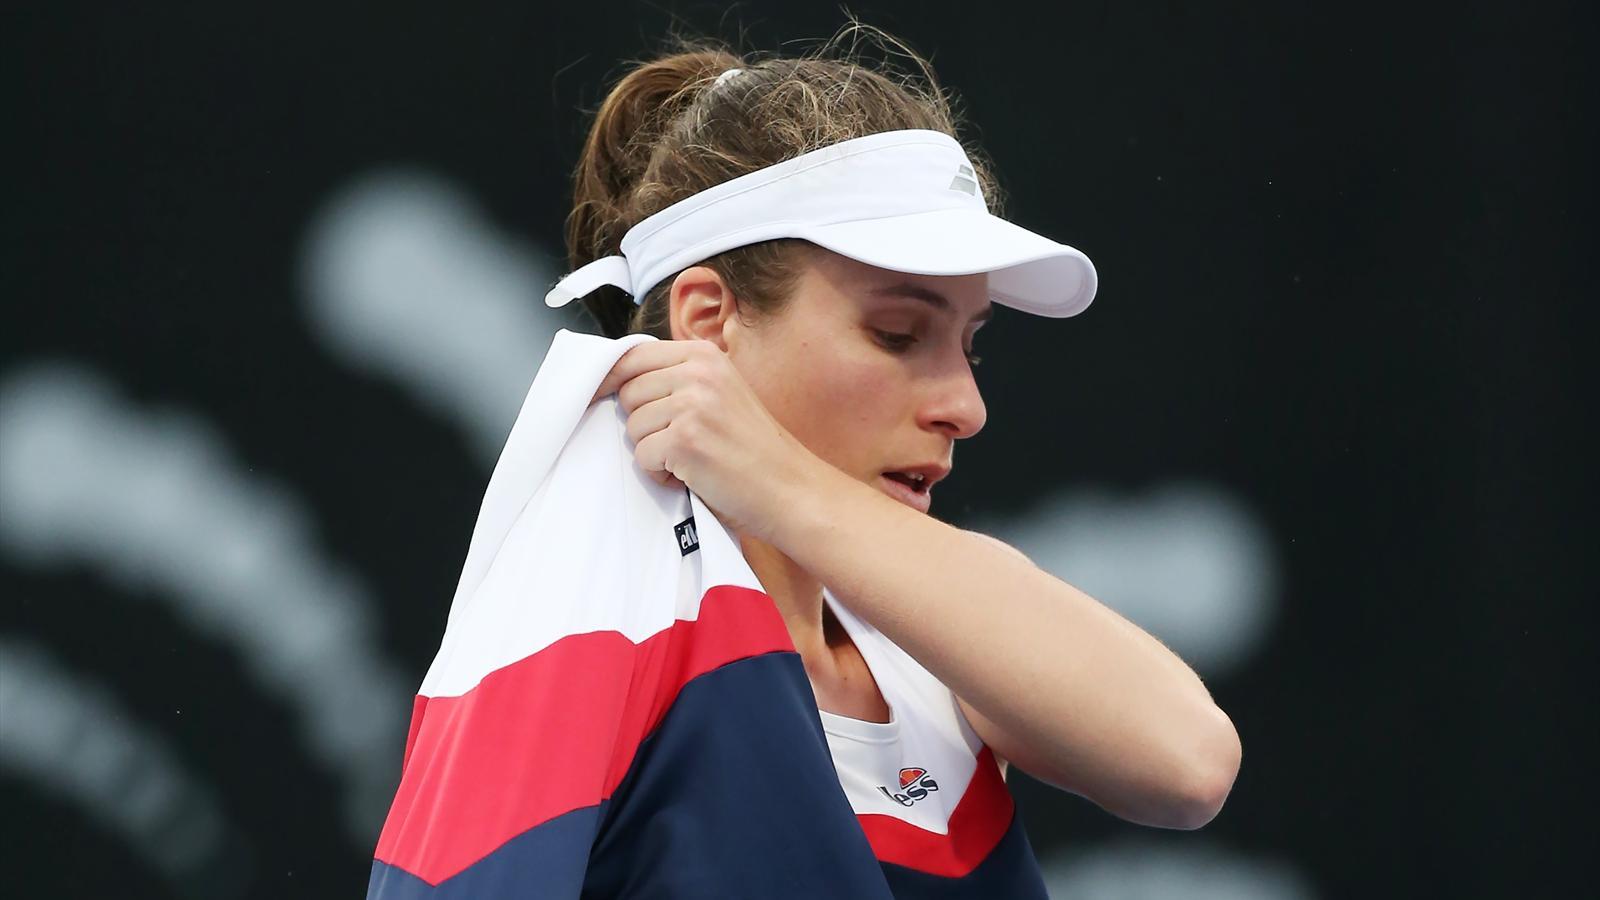 Tennis News Johanna Konta Suffers Neck Injury Just Week